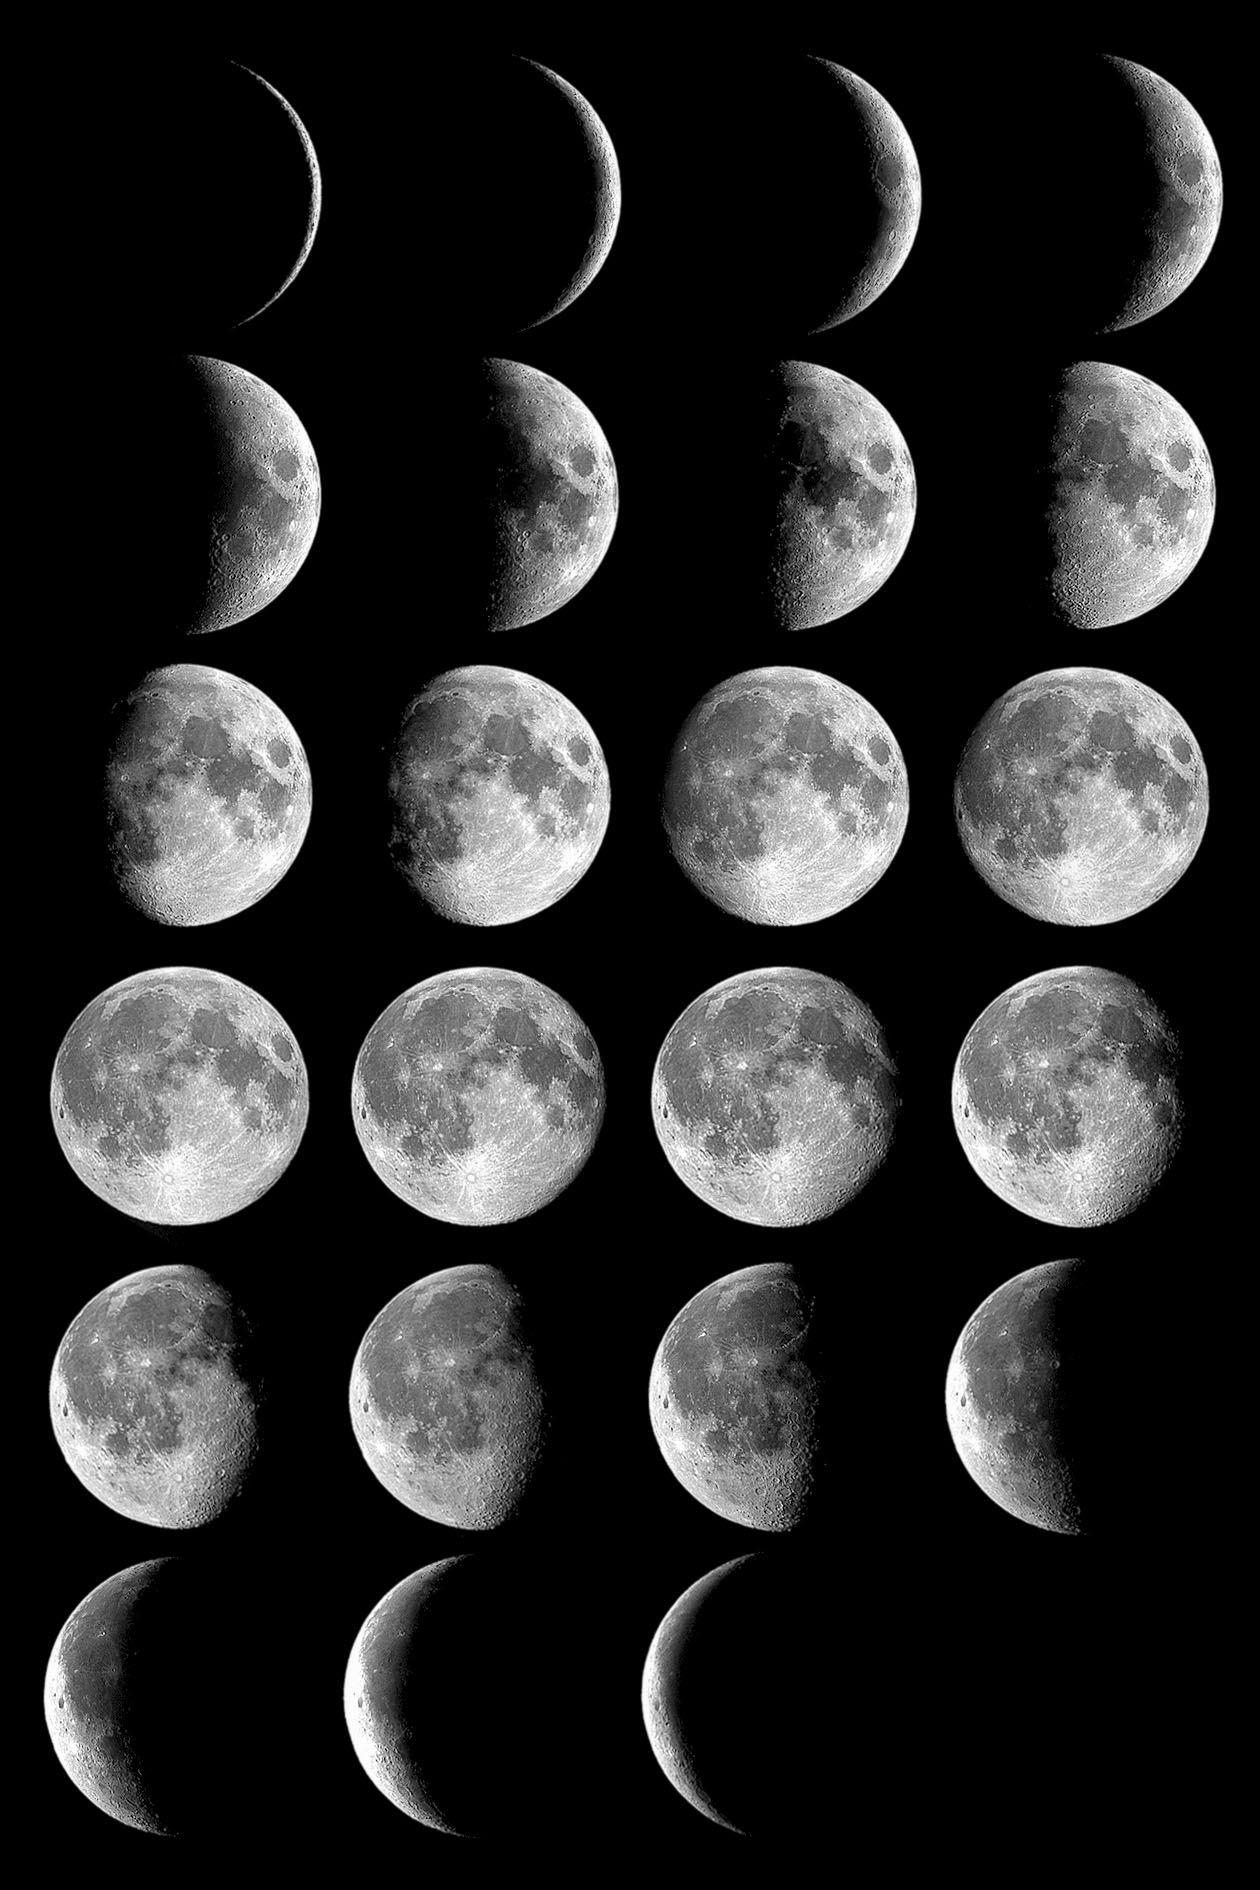 Phases Fases De La Luna Luna Fondos De Pantalla Luz De La Luna